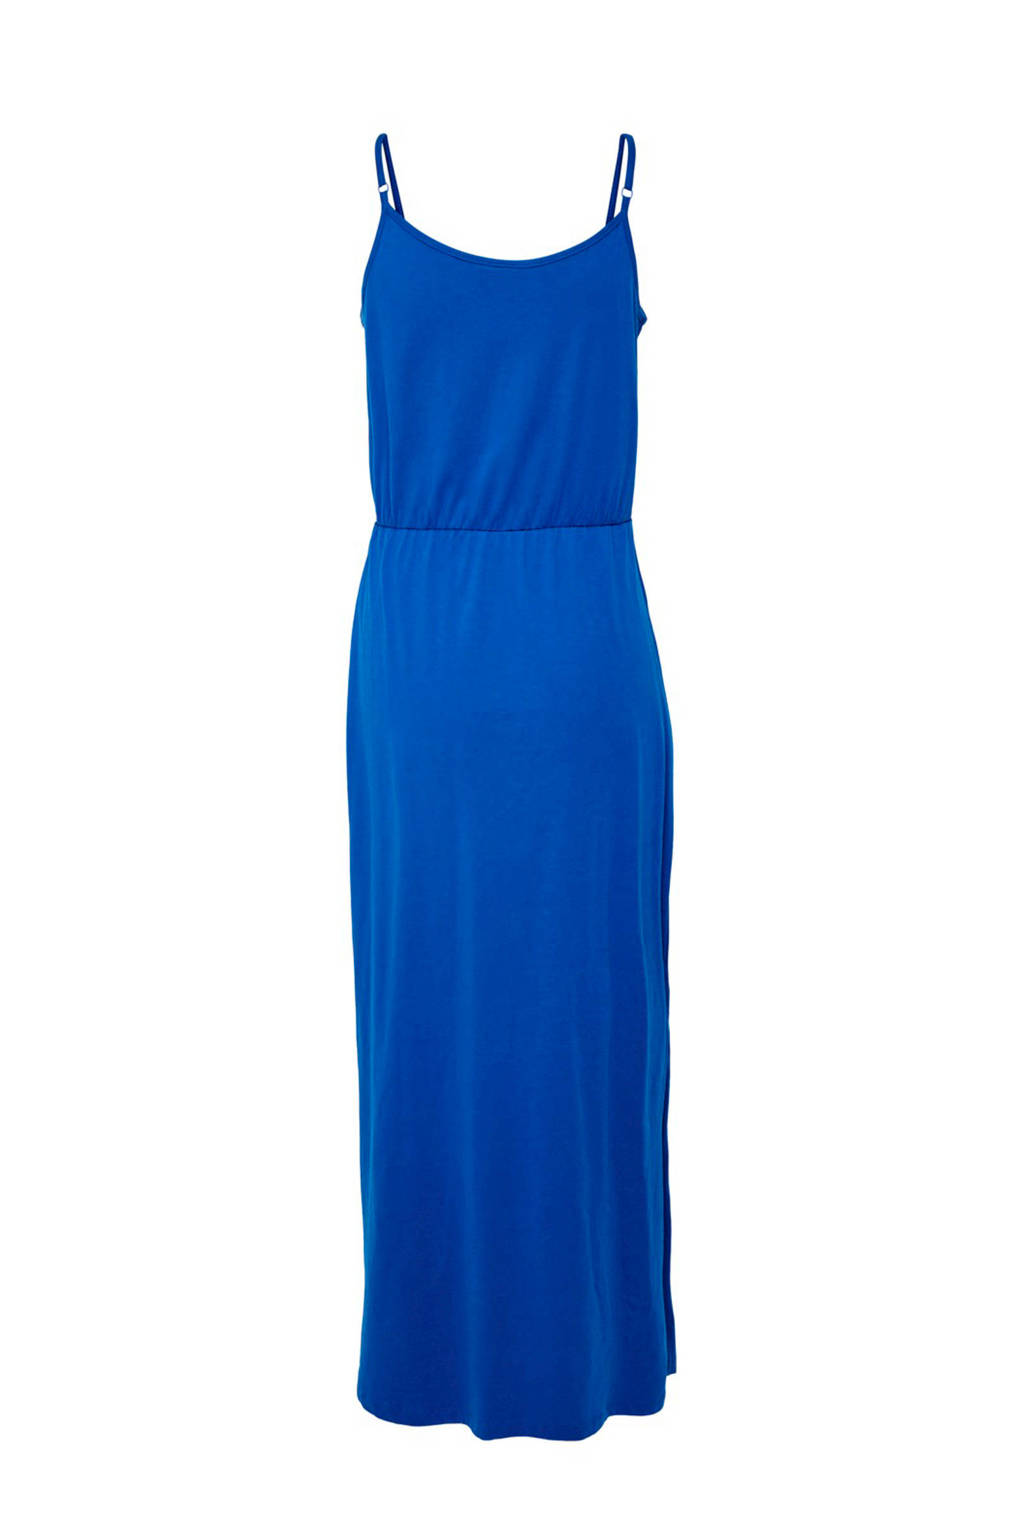 bbc481426efe54 JACQUELINE DE YONG mouwloze maxi jurk blauw